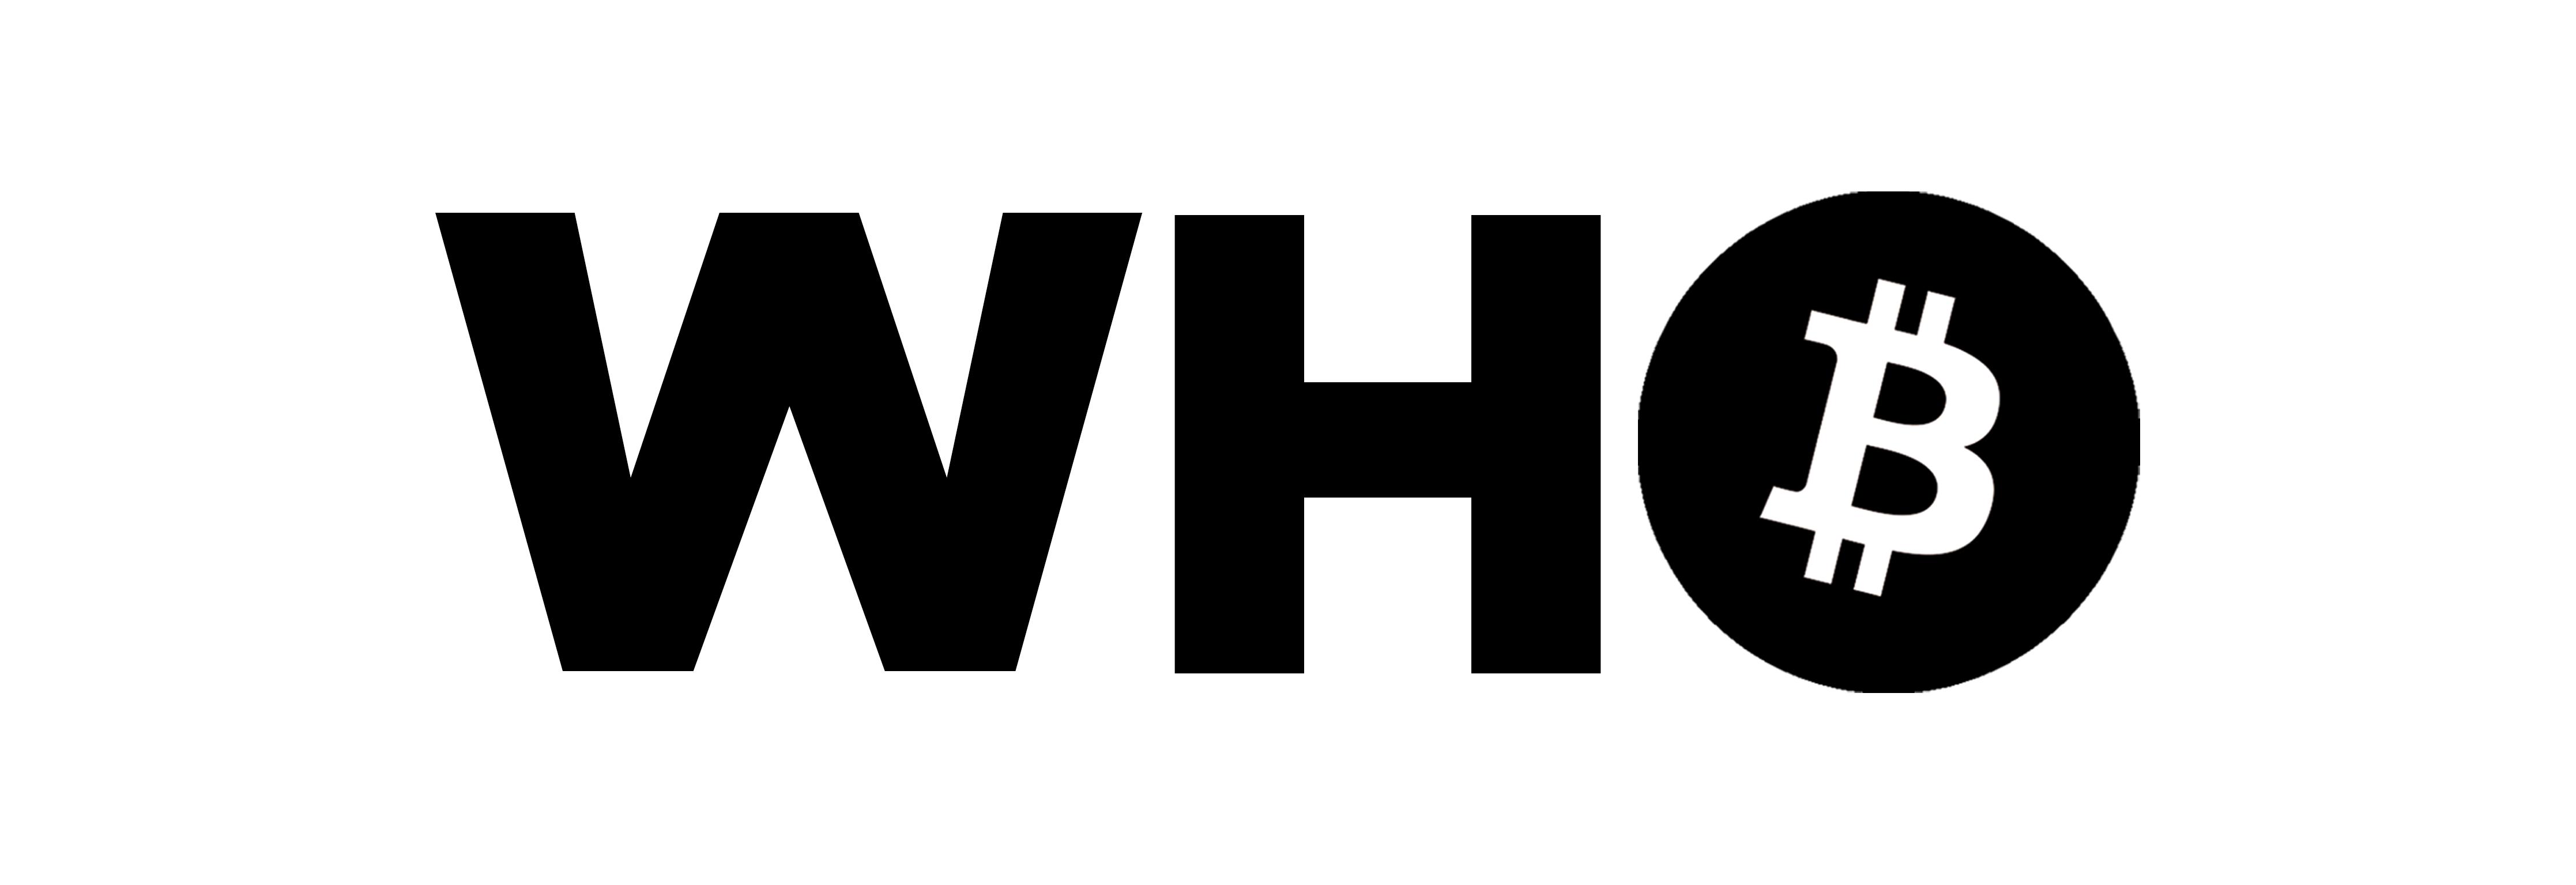 who 4 2